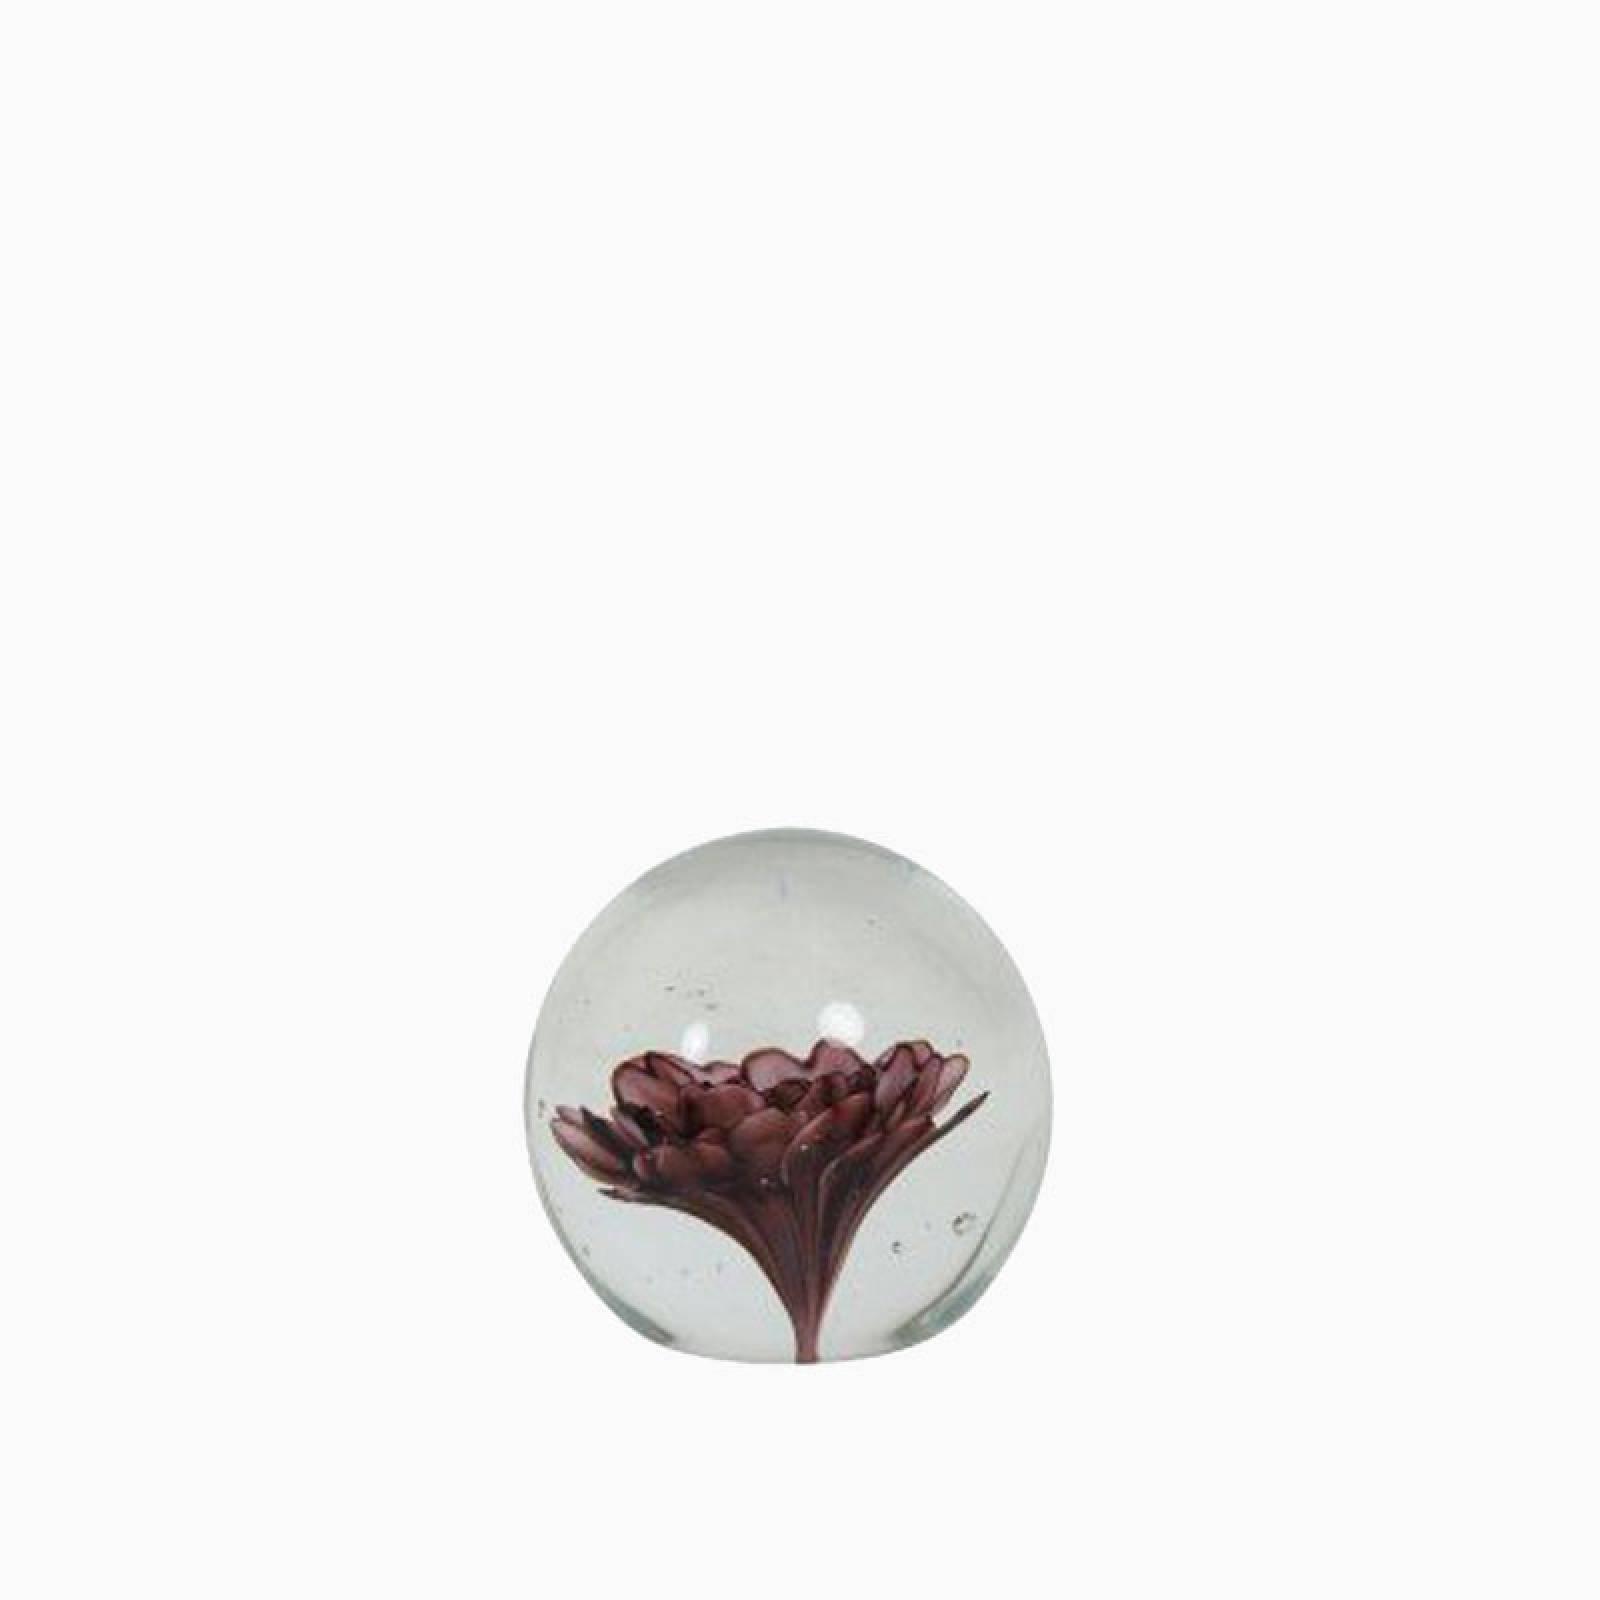 Glass Purple Flower Paperweight 8.5x8.5cm